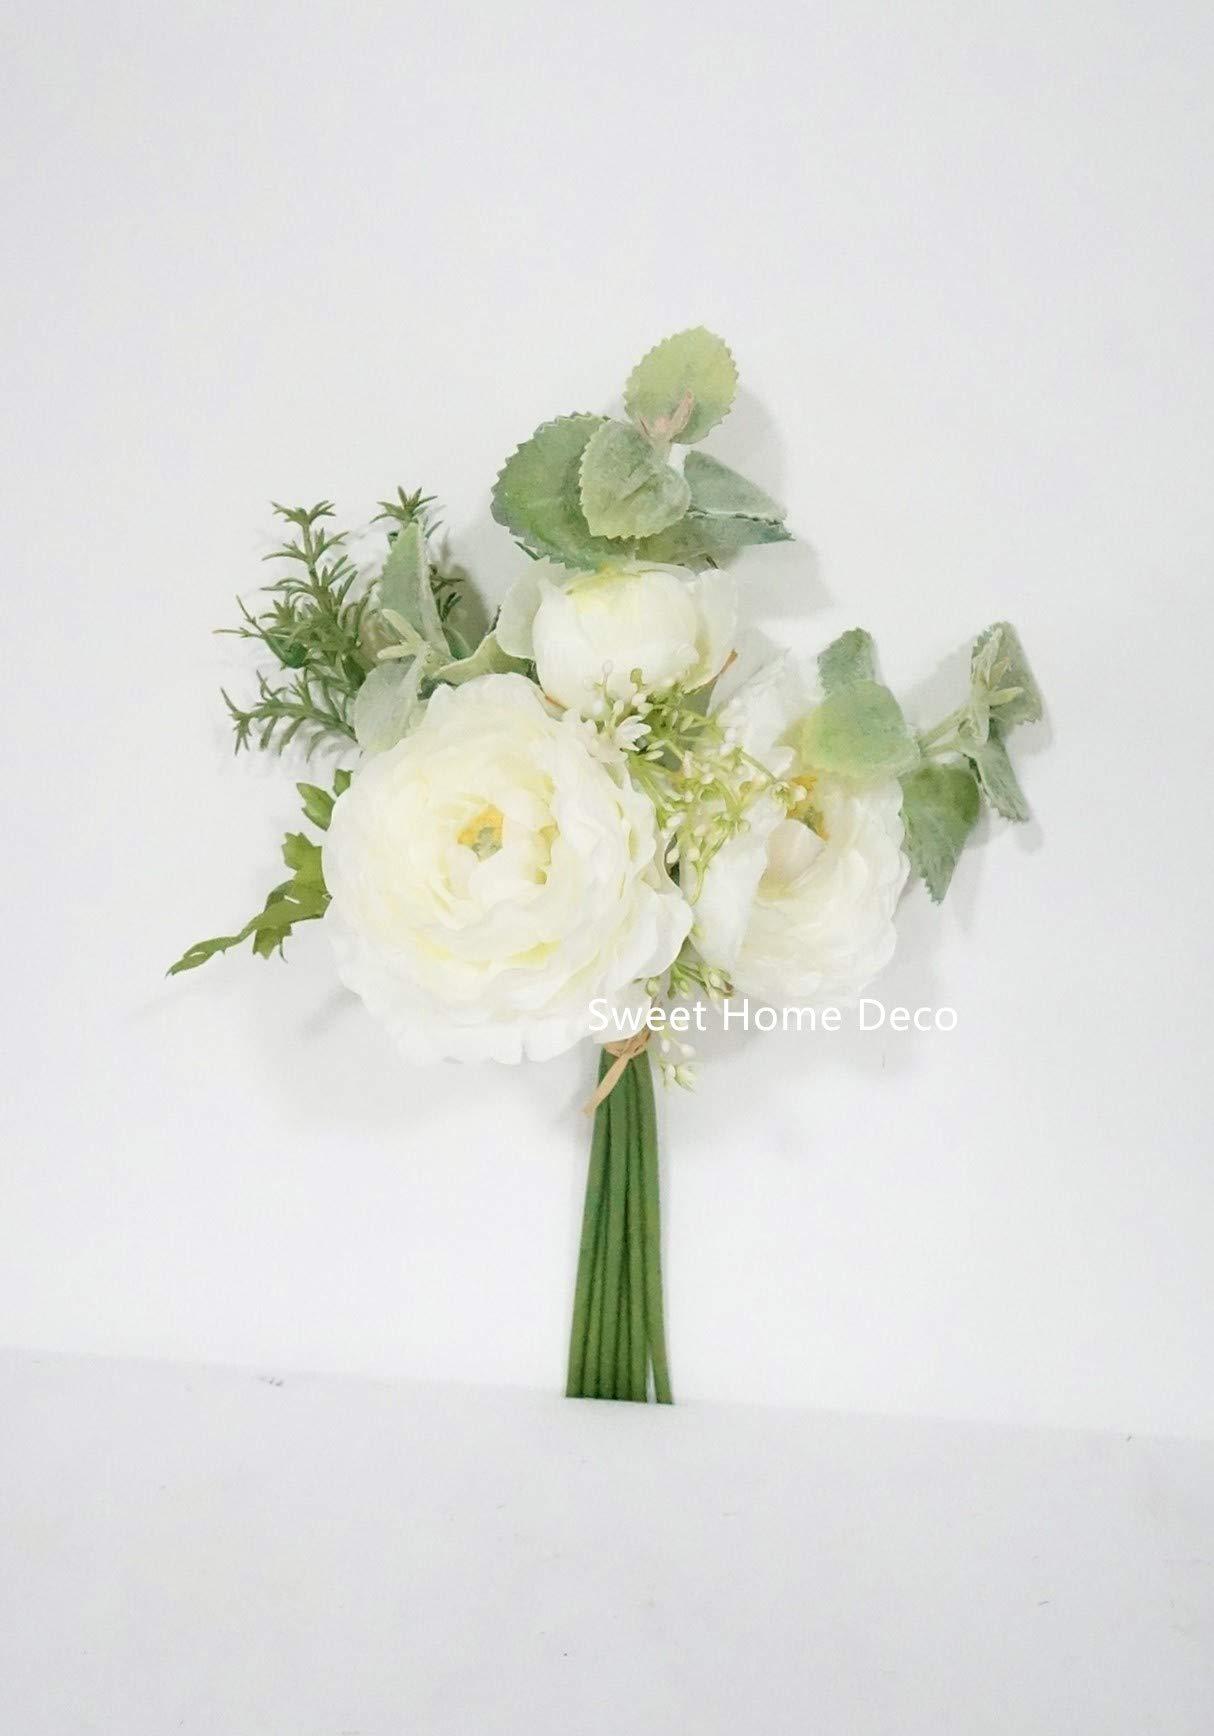 silk flower arrangements sweet home deco 12'' spring silk ranunculus flower bouquet w/greenery for wedding/home decorations, floral design, rustic bouquet (white)